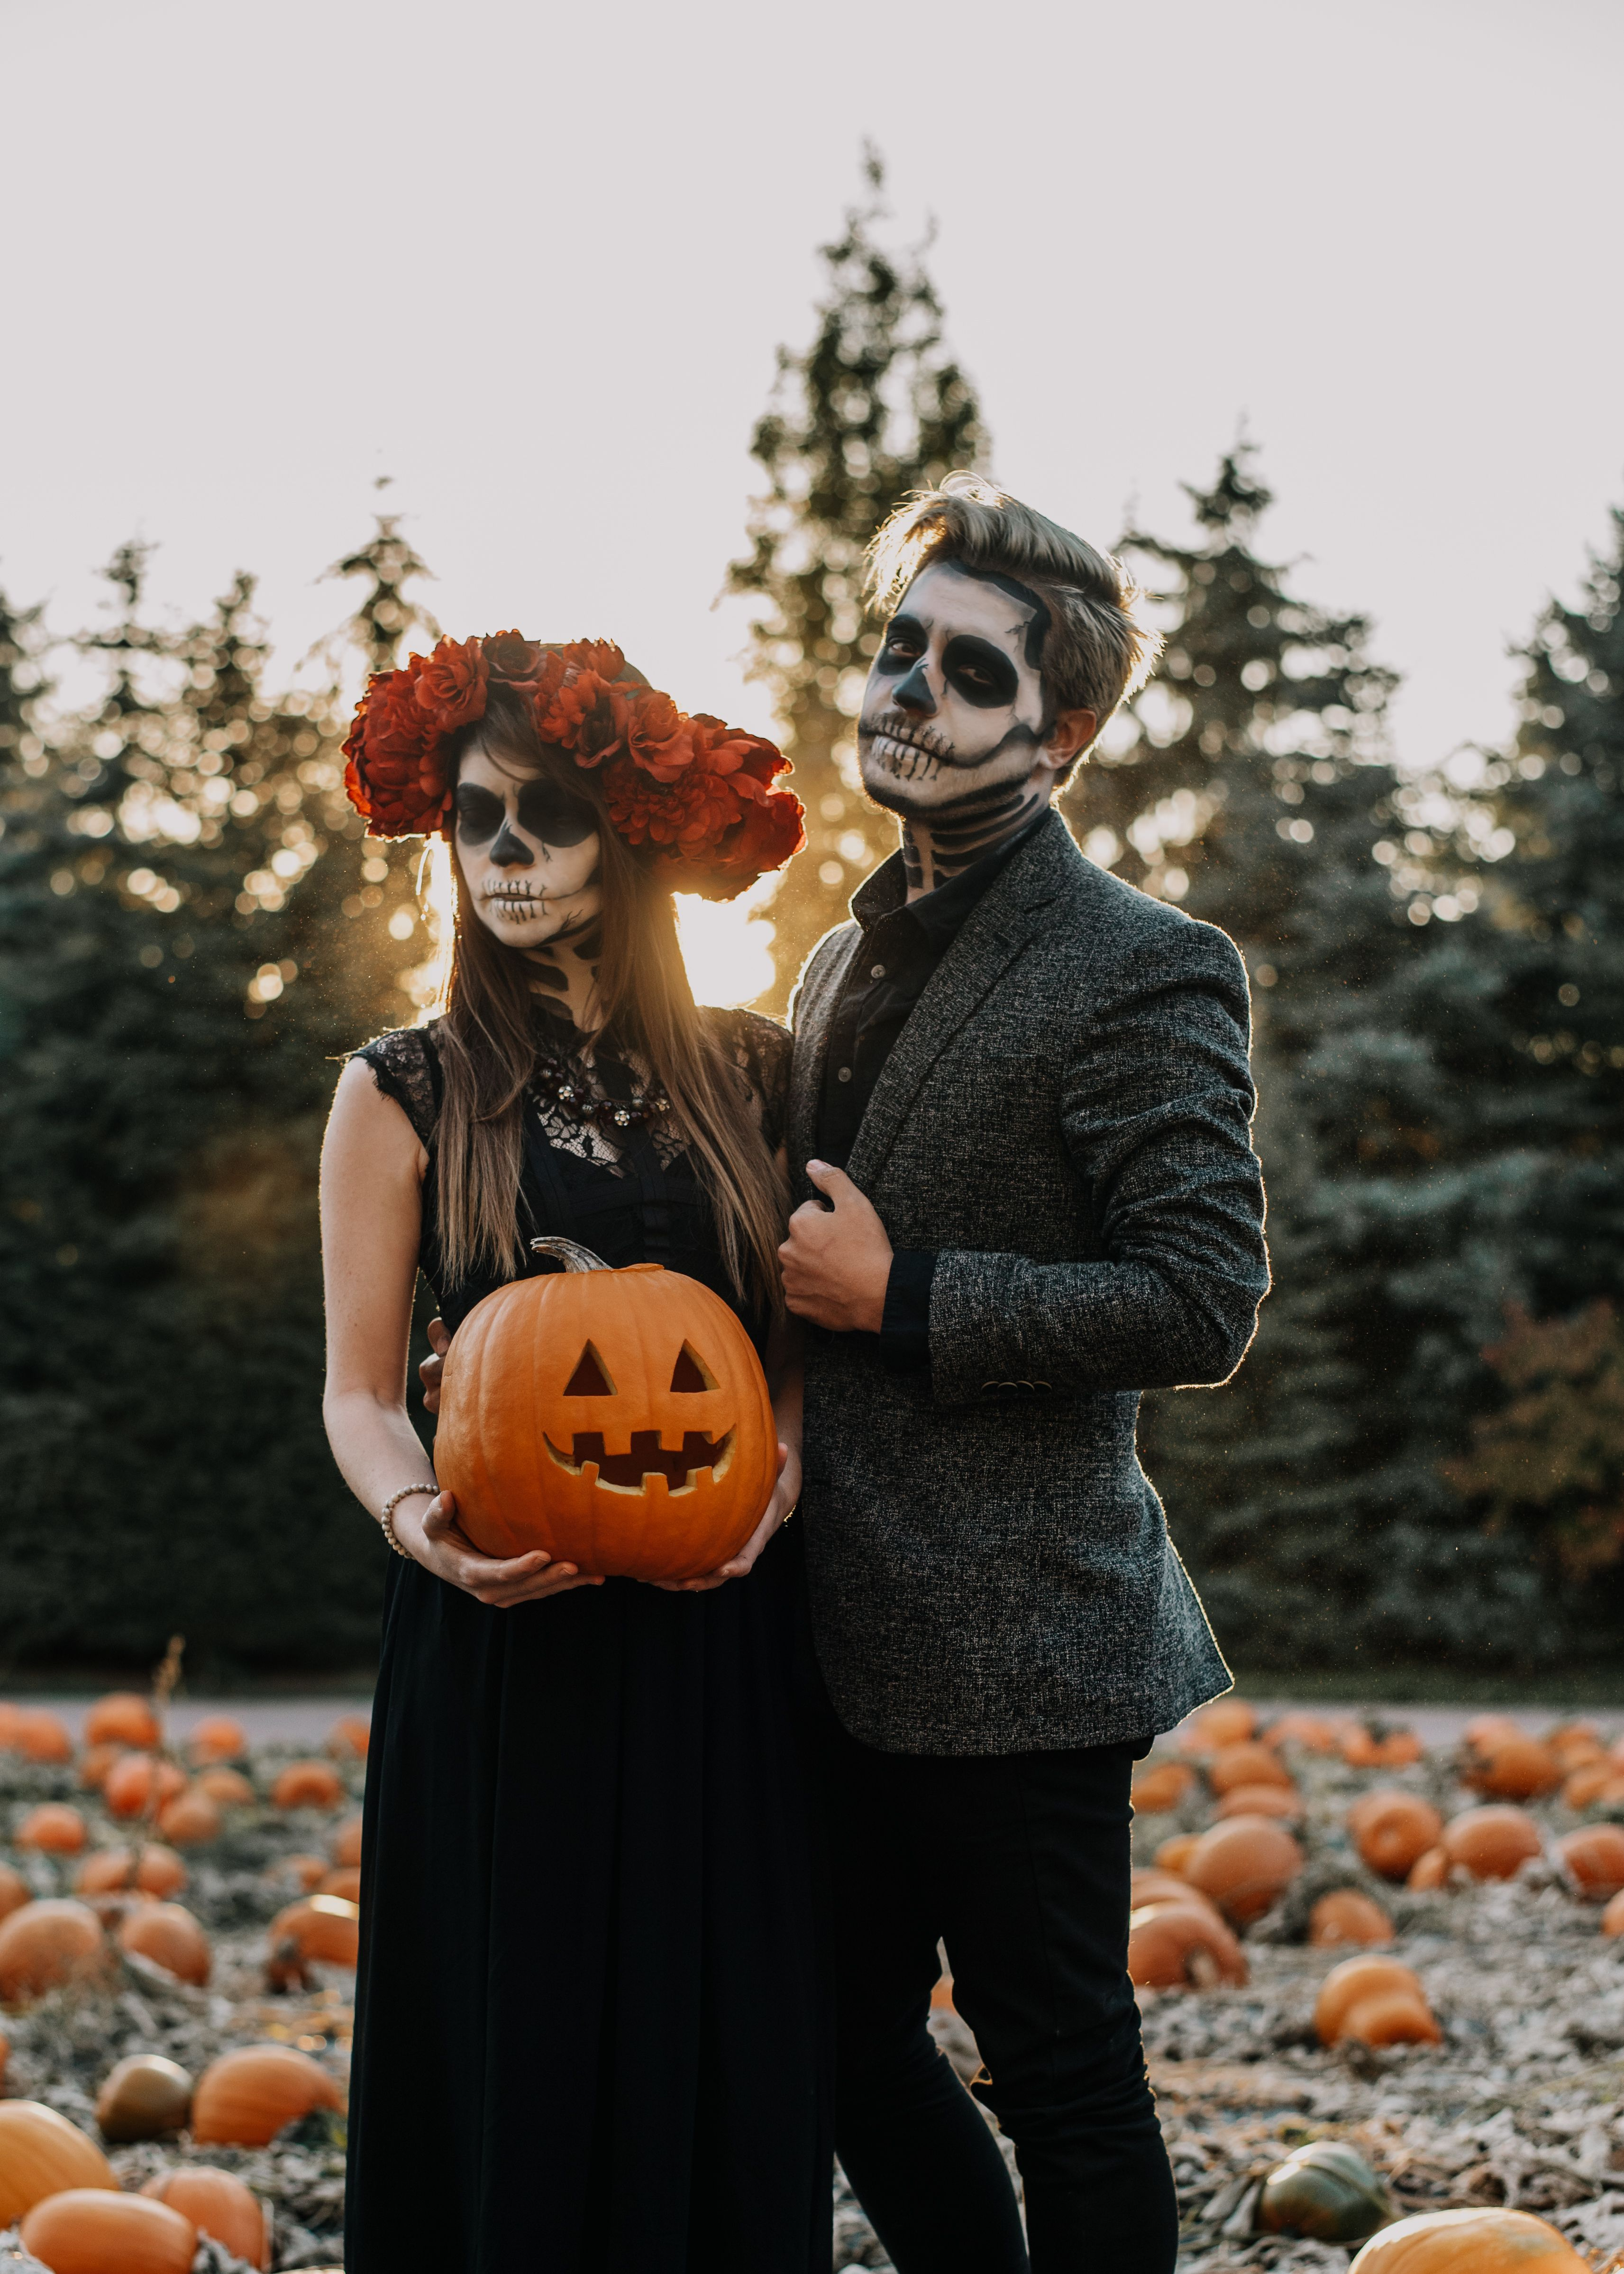 Skeleton Couple's shoot with smoke bombs, pumpkins, and